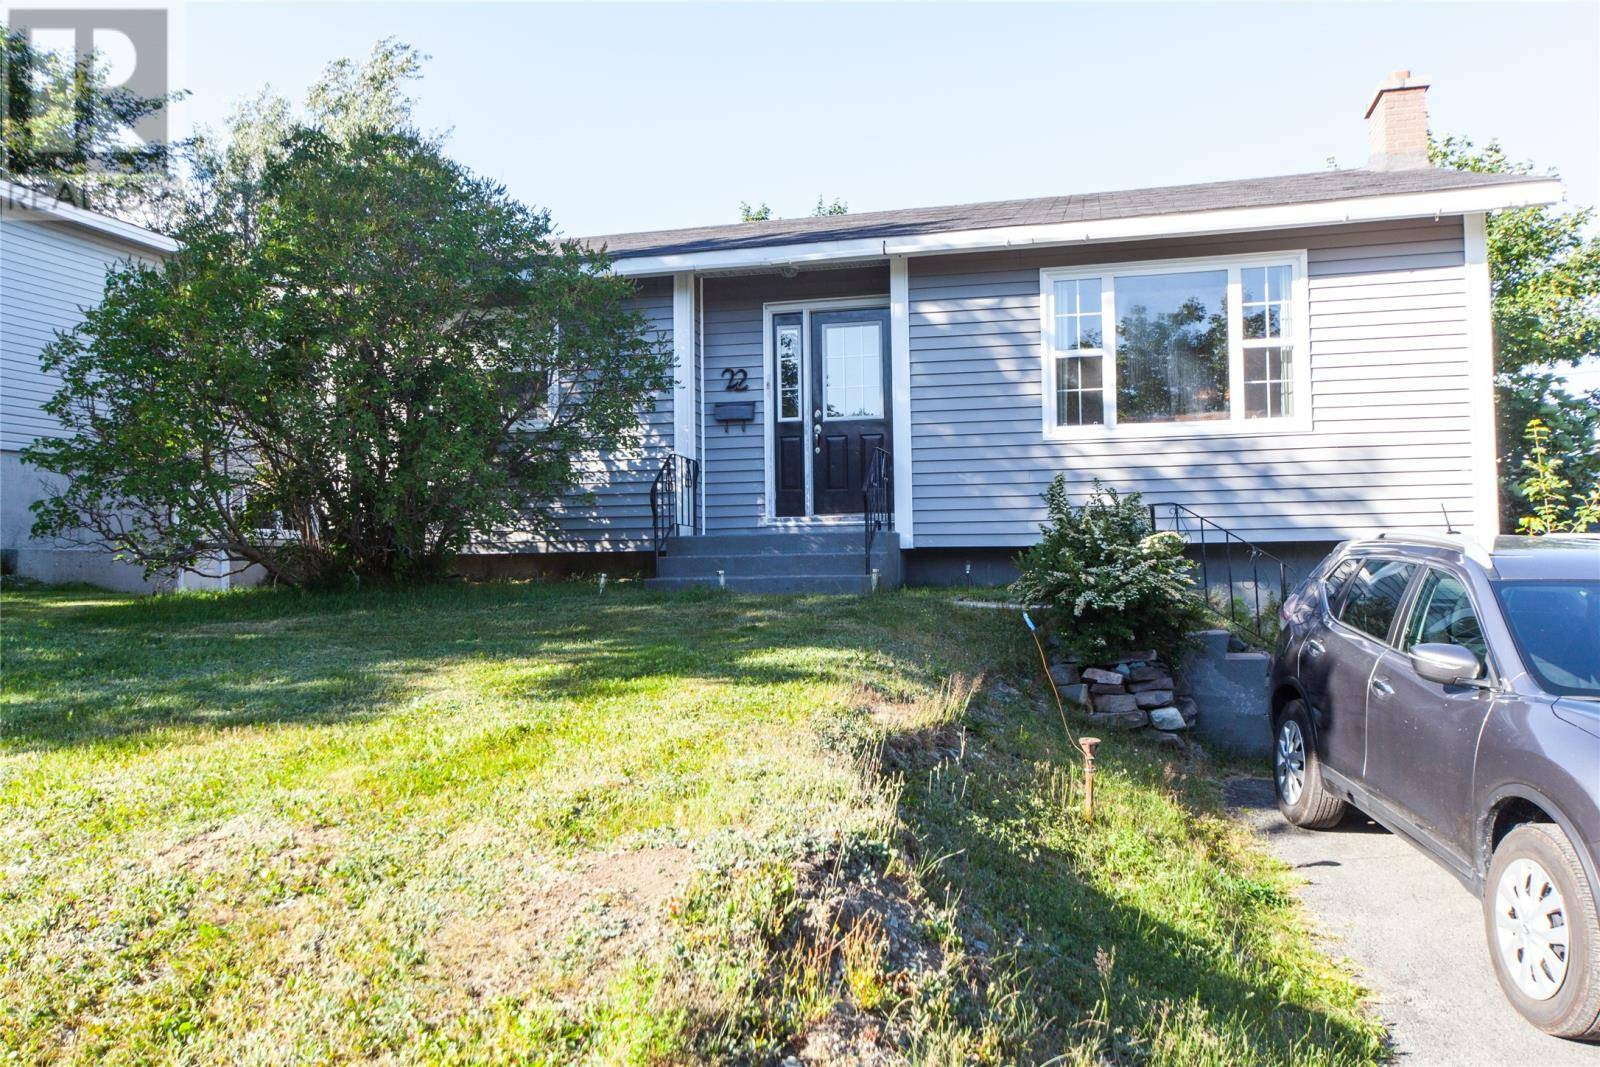 House for rent at 22 Ottawa St St. John's Newfoundland - MLS: 1212288